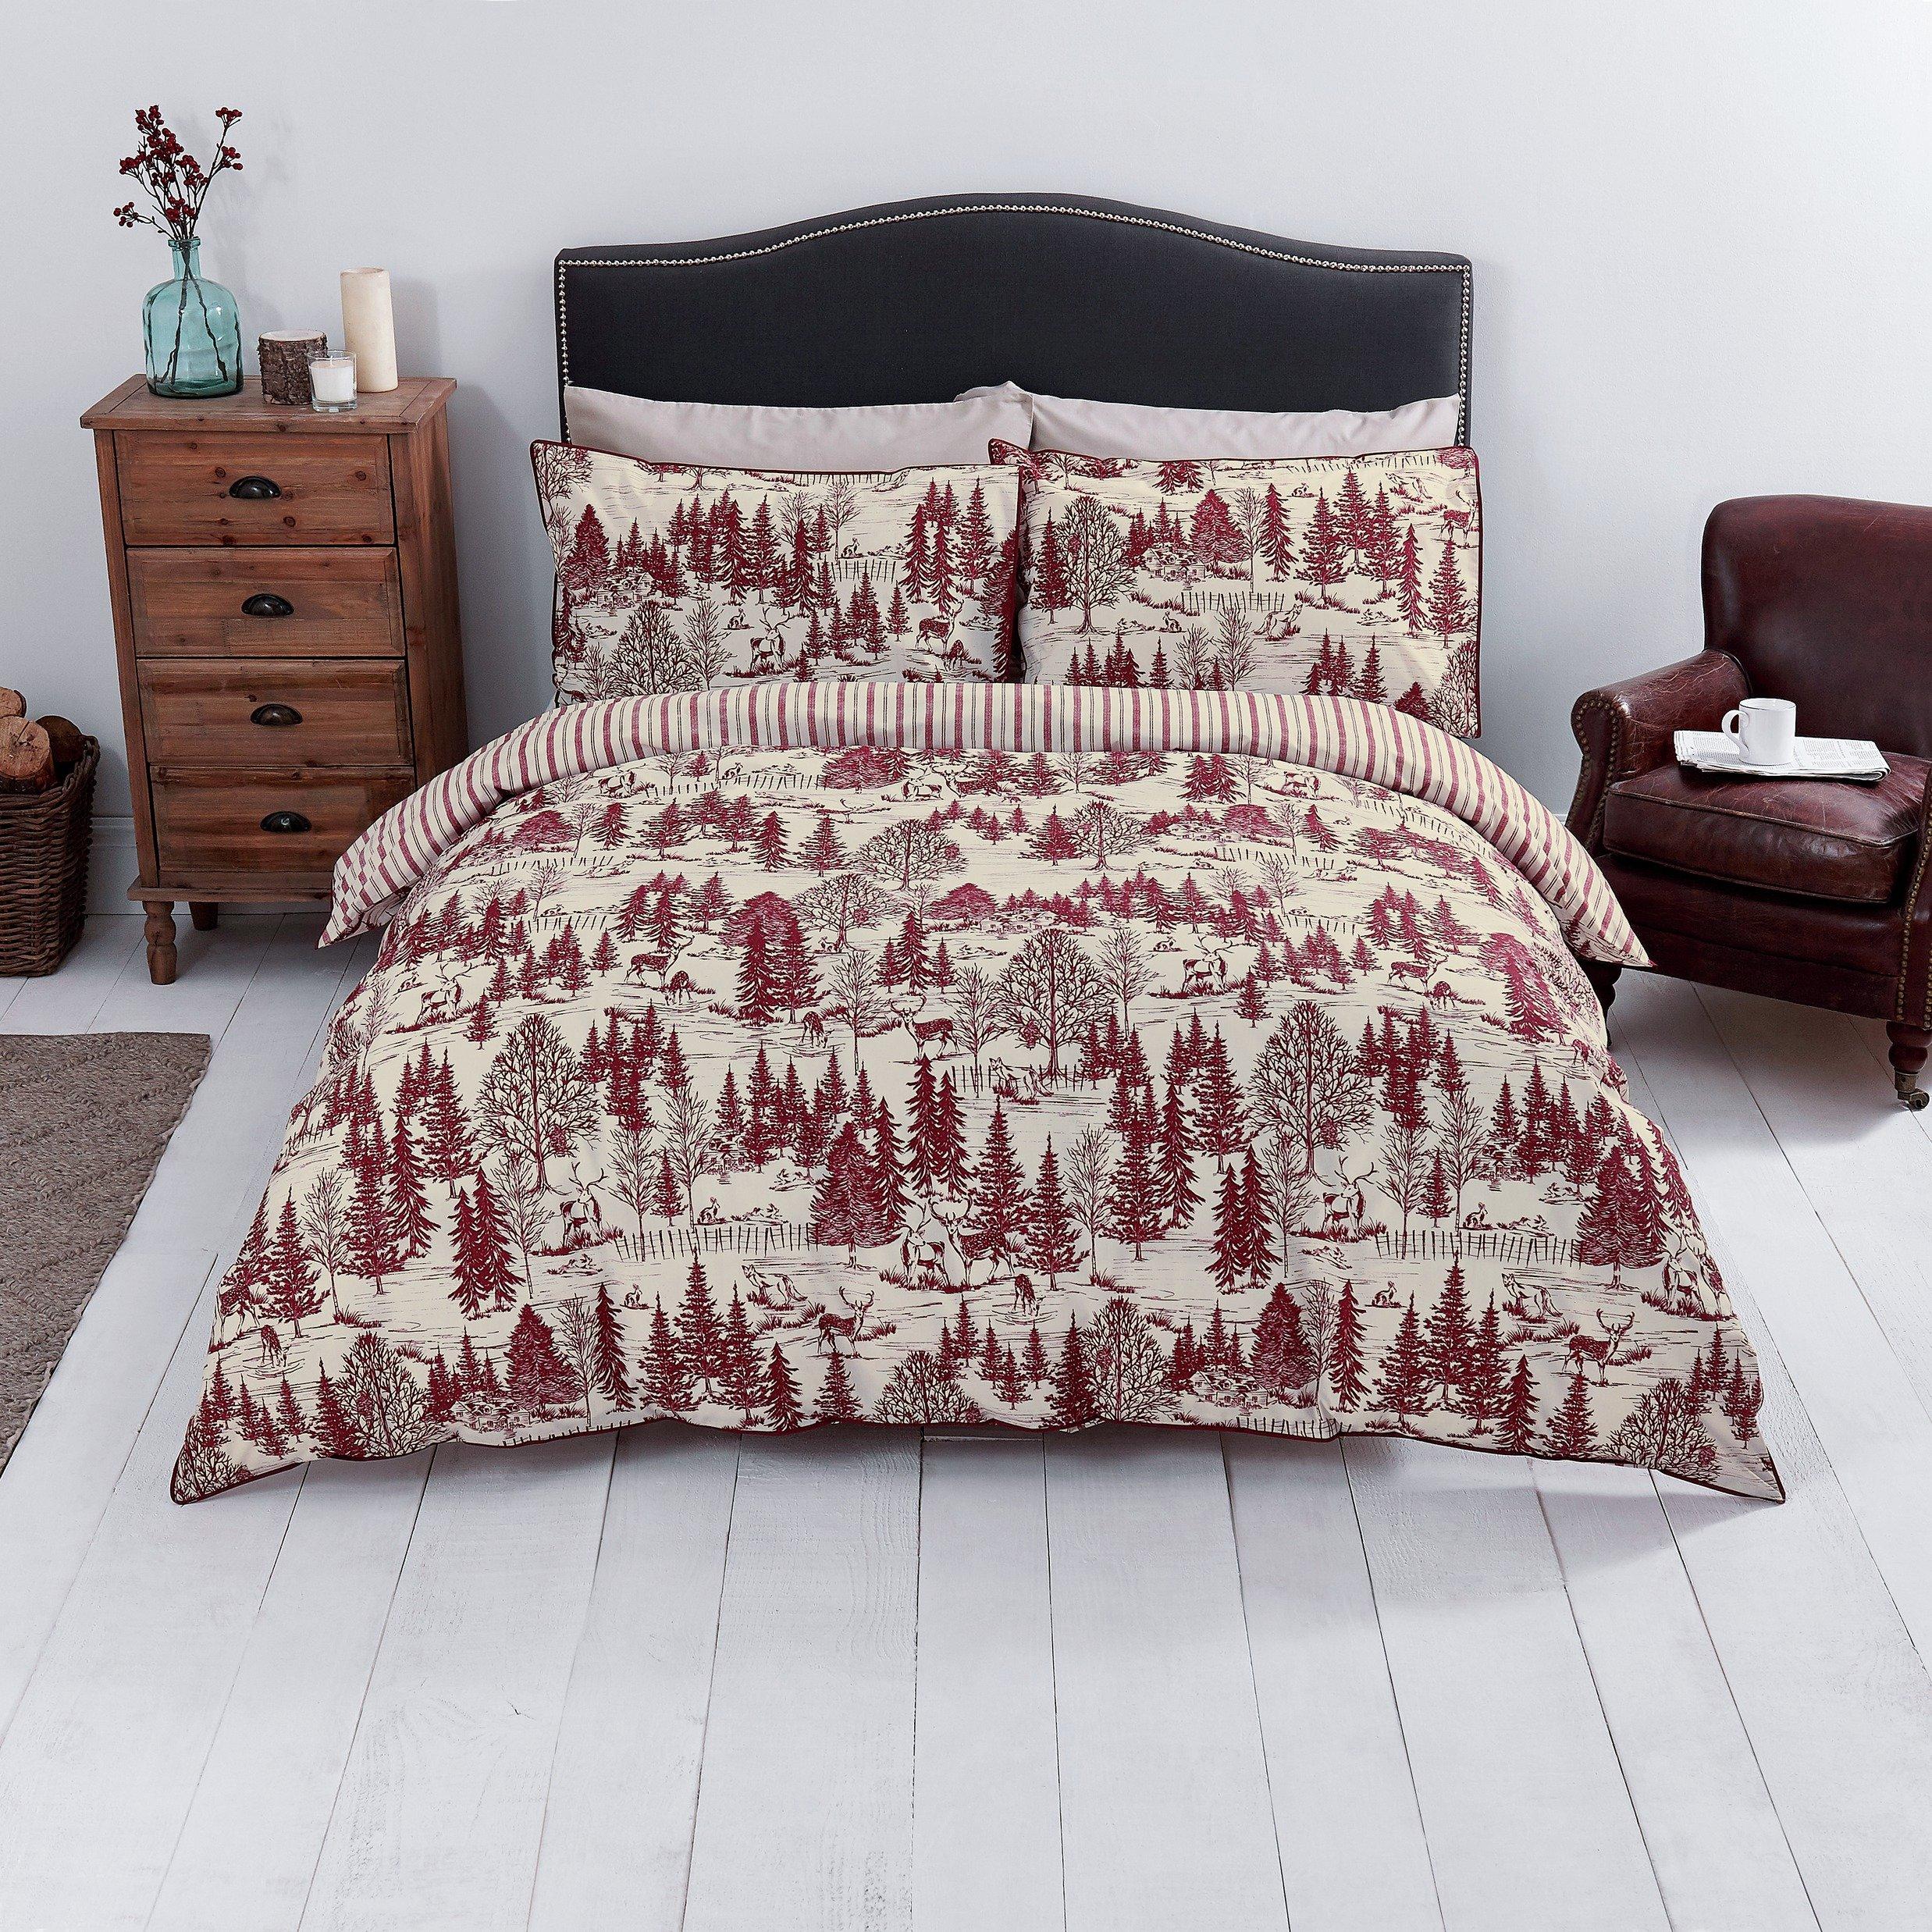 sale on sainsbury 39 s home red toile printed bedding set. Black Bedroom Furniture Sets. Home Design Ideas